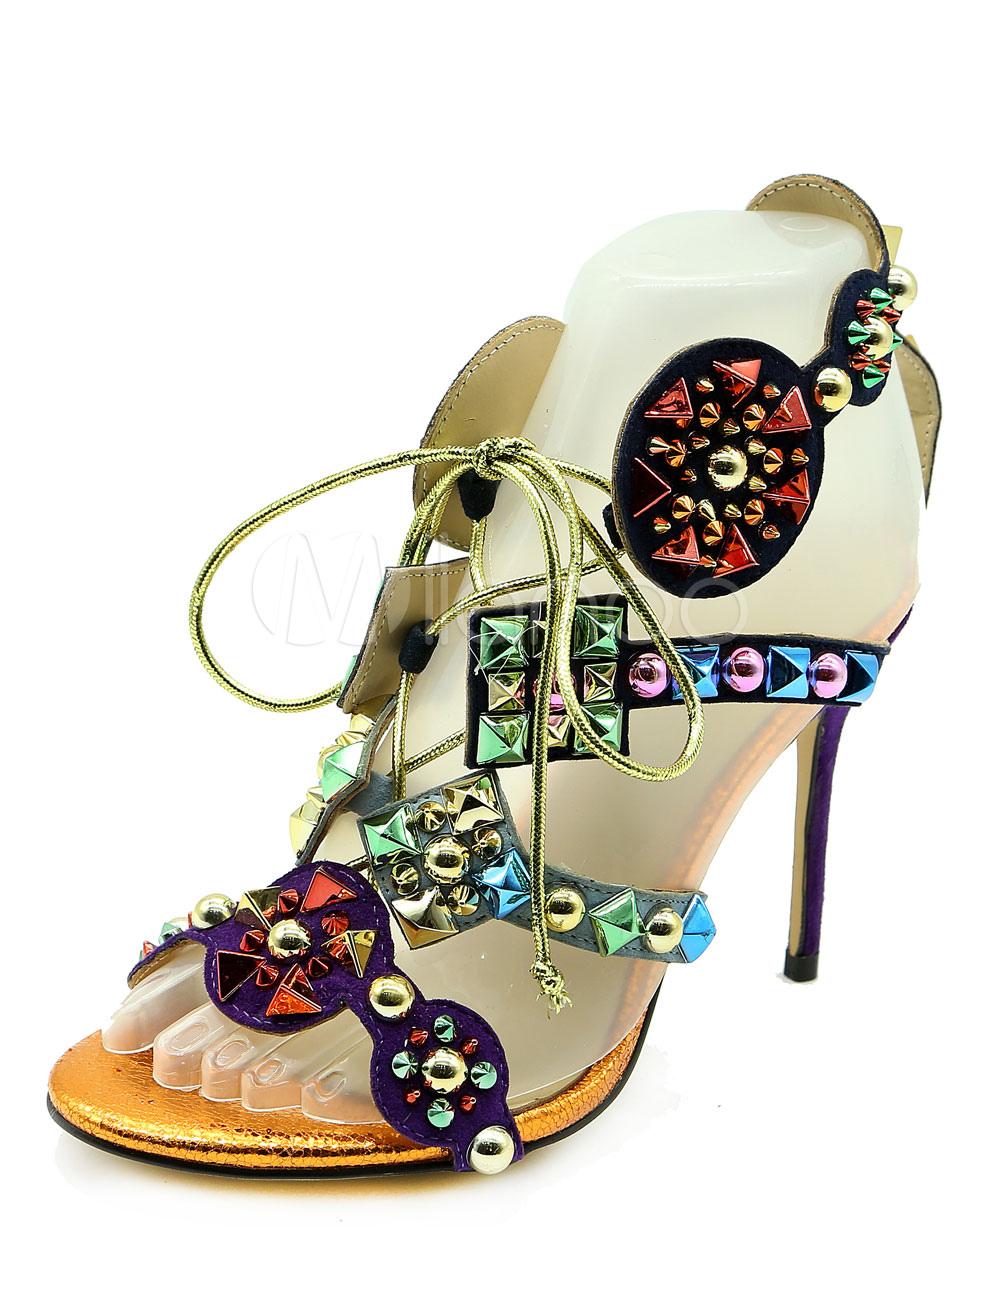 Purple Sandal Shoes Women's High Heel Stiletto Open Toe Lace Up Rivets Sandals